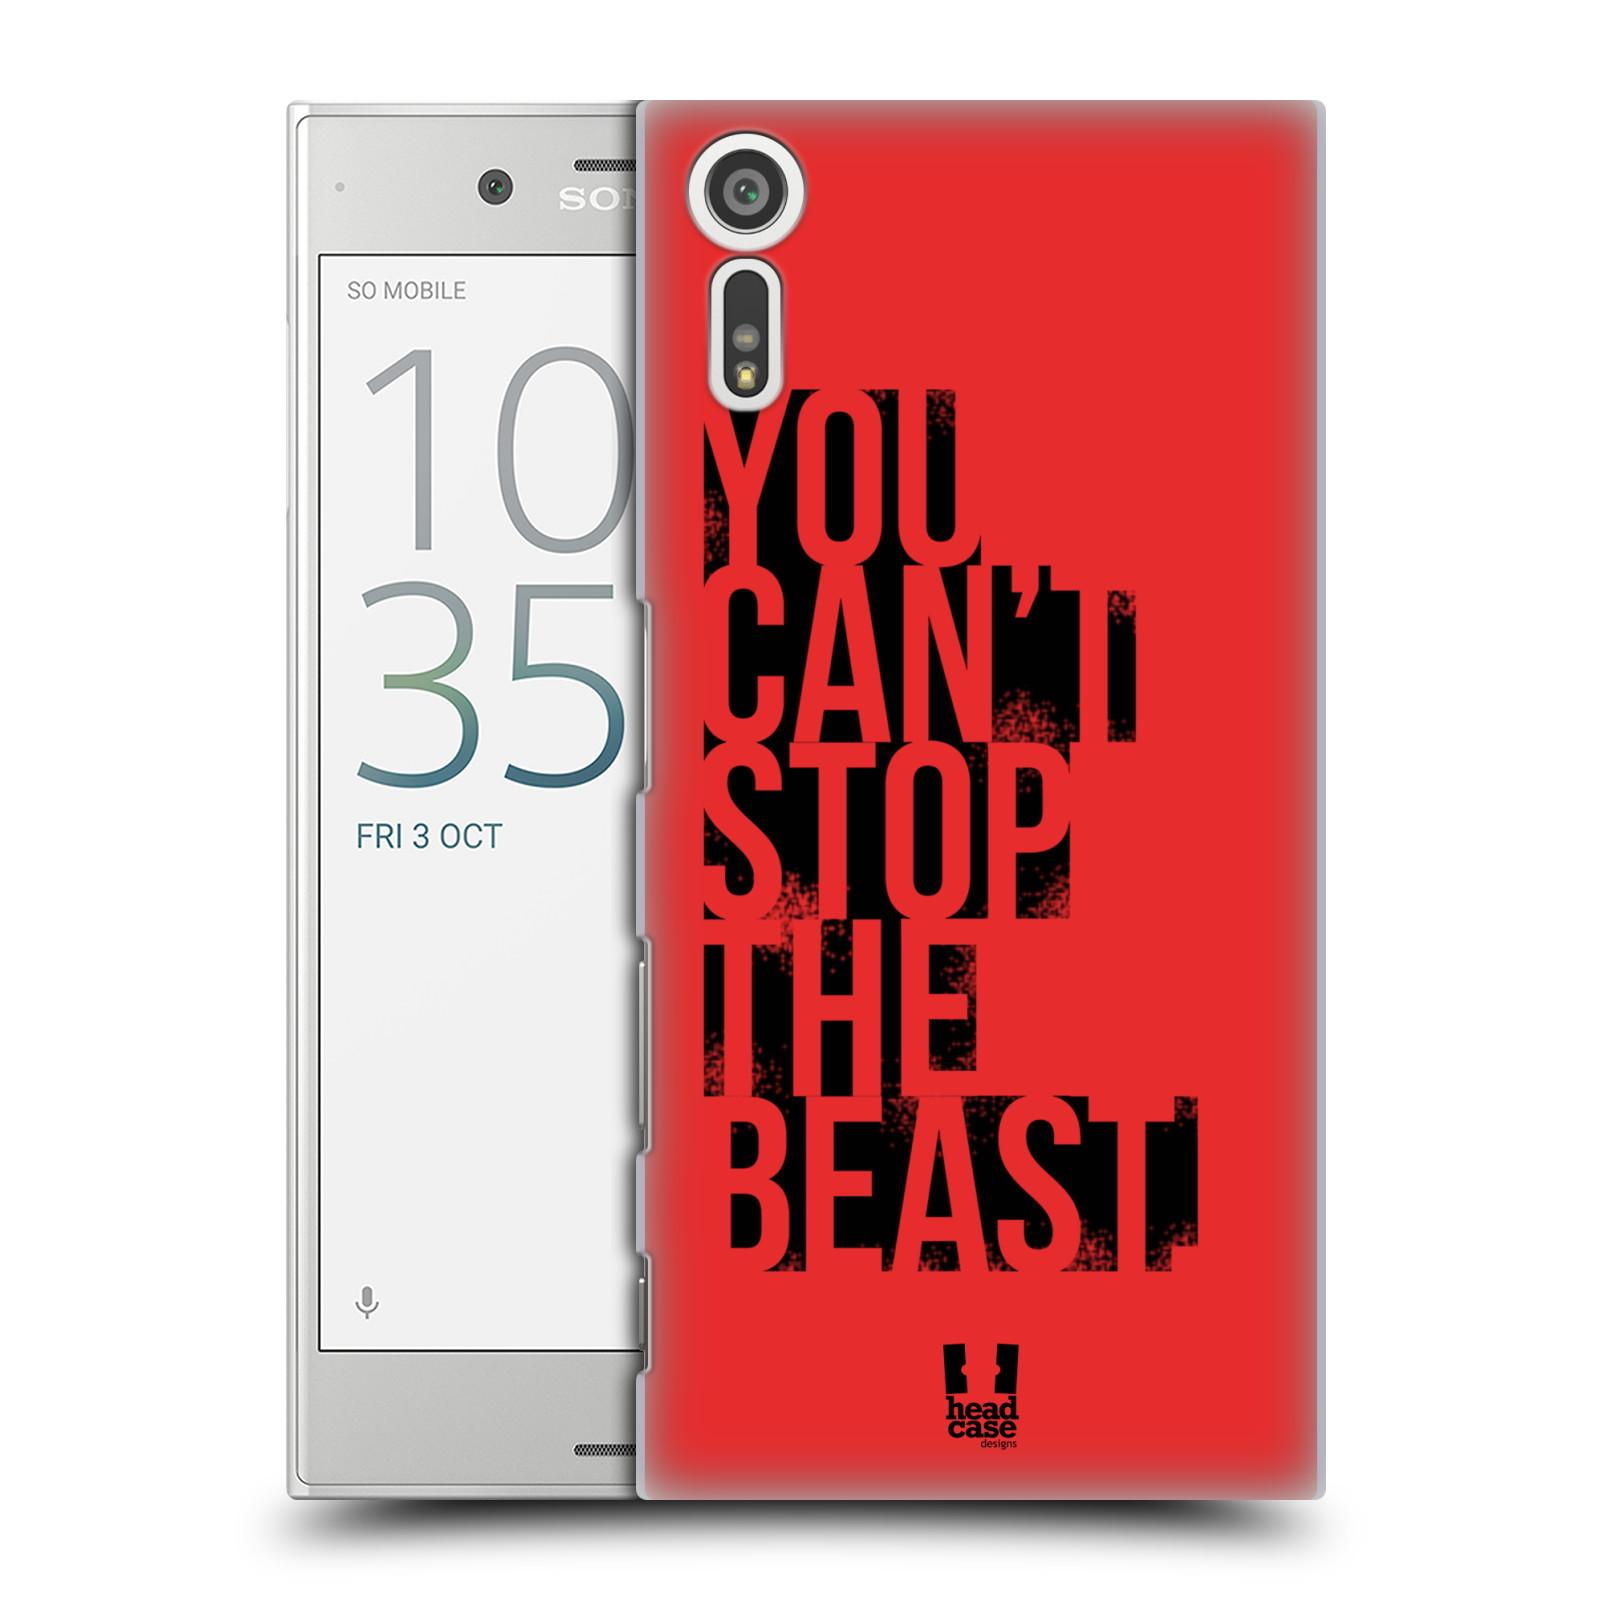 HEAD CASE plastový obal na mobil Sony Xperia XZ Sportovní tématika Beast mode červená